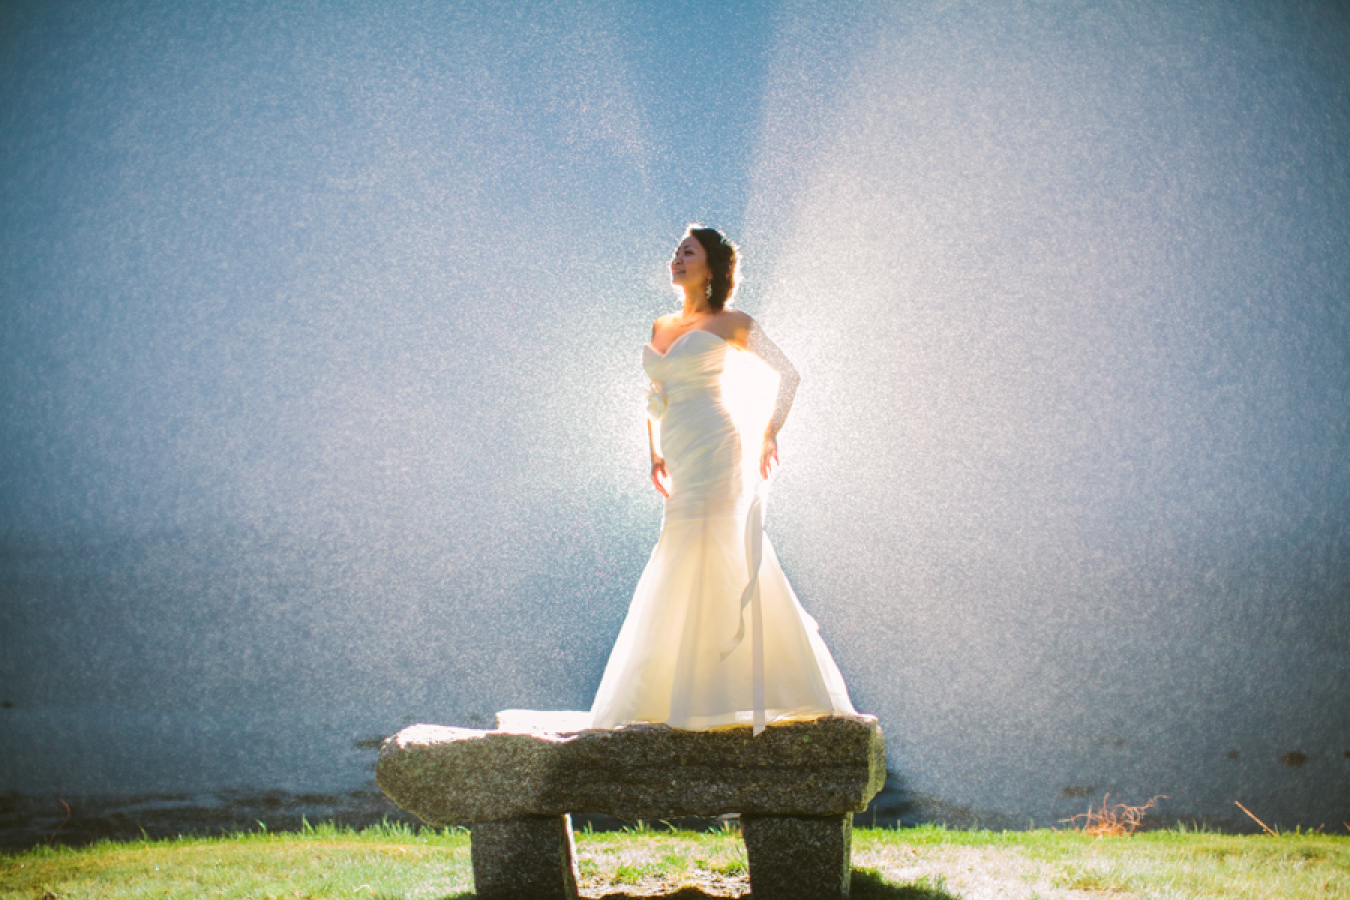 Coastal Maine Wedding | Photo by Rebecca Arthurs www.rebecca-arthurs.com